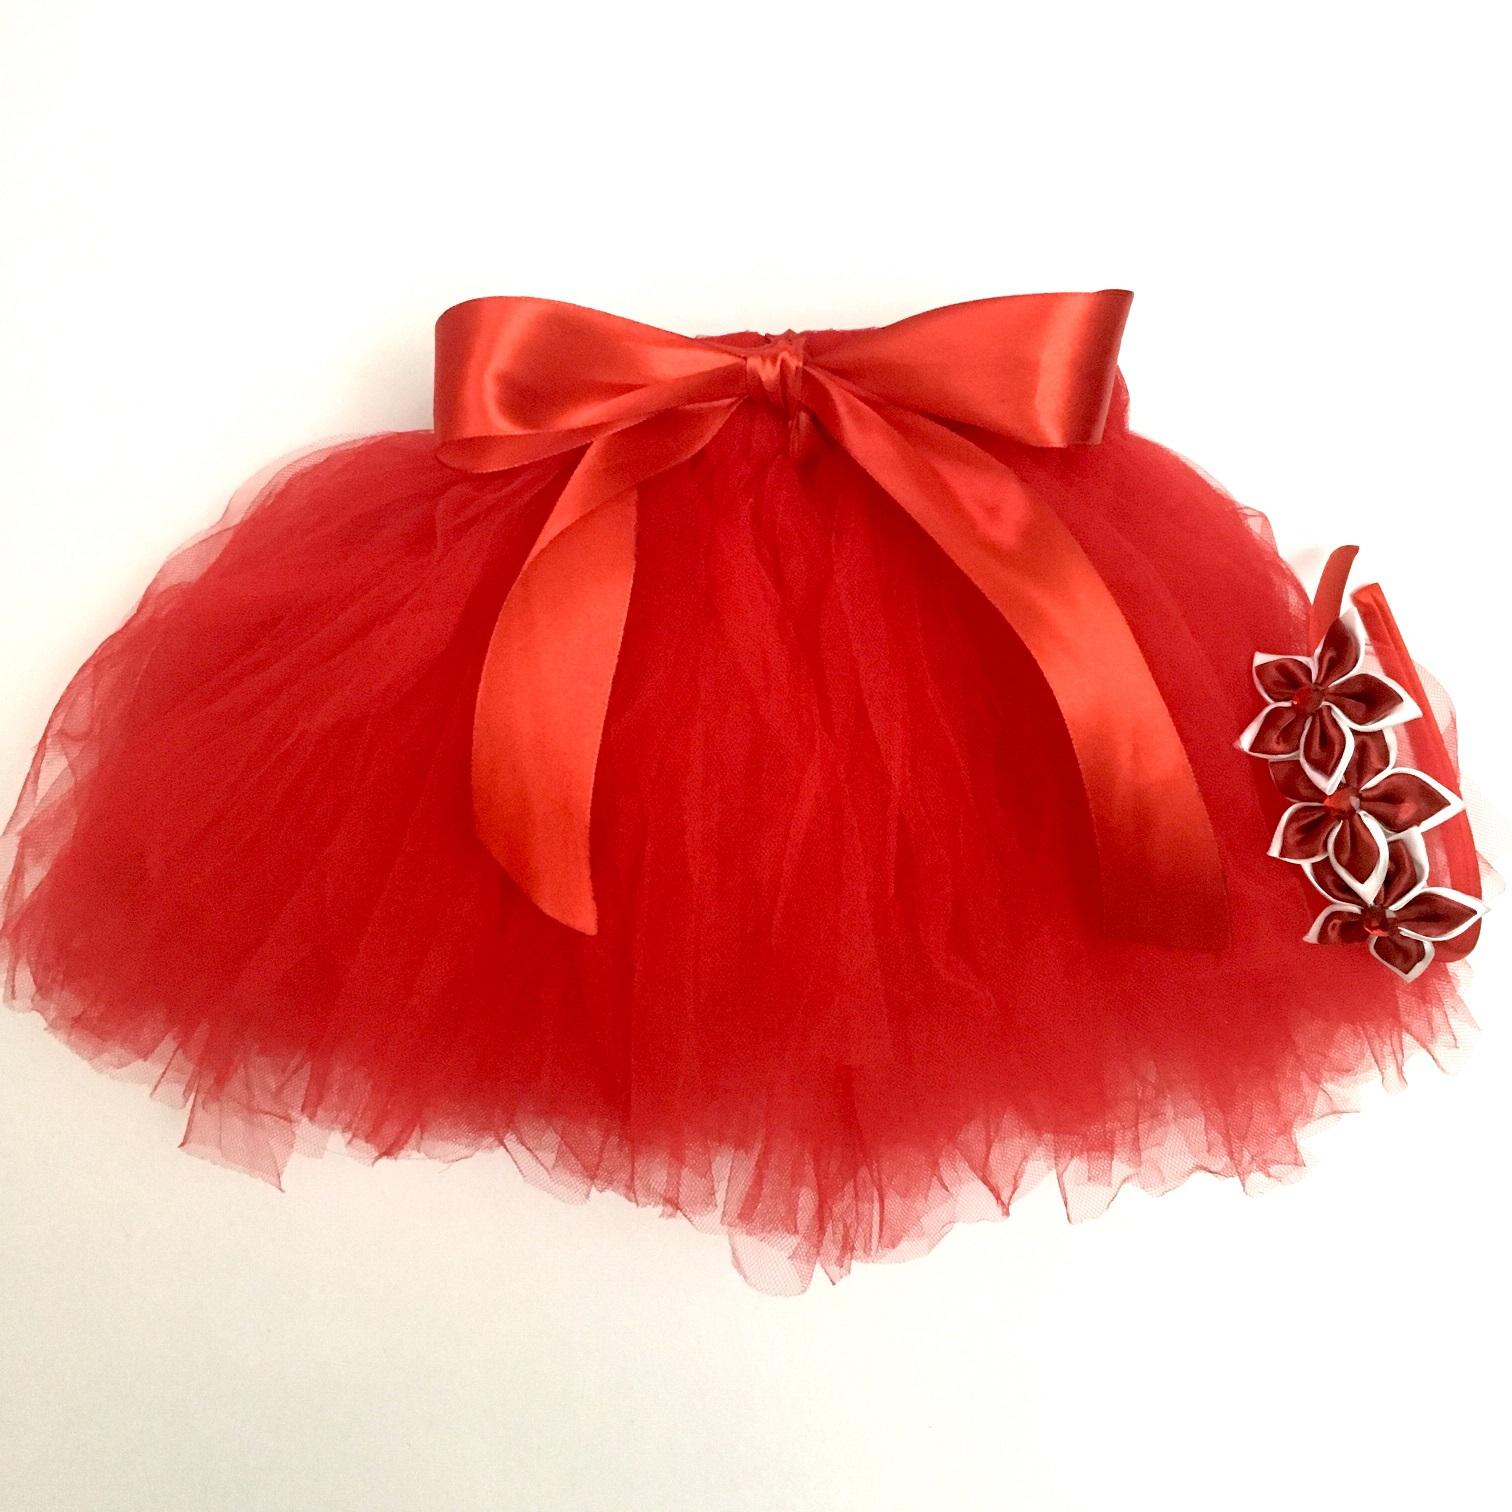 ba78cf92ad5 Tutu suknička červená (1-3 roky) - jupitershop.sk